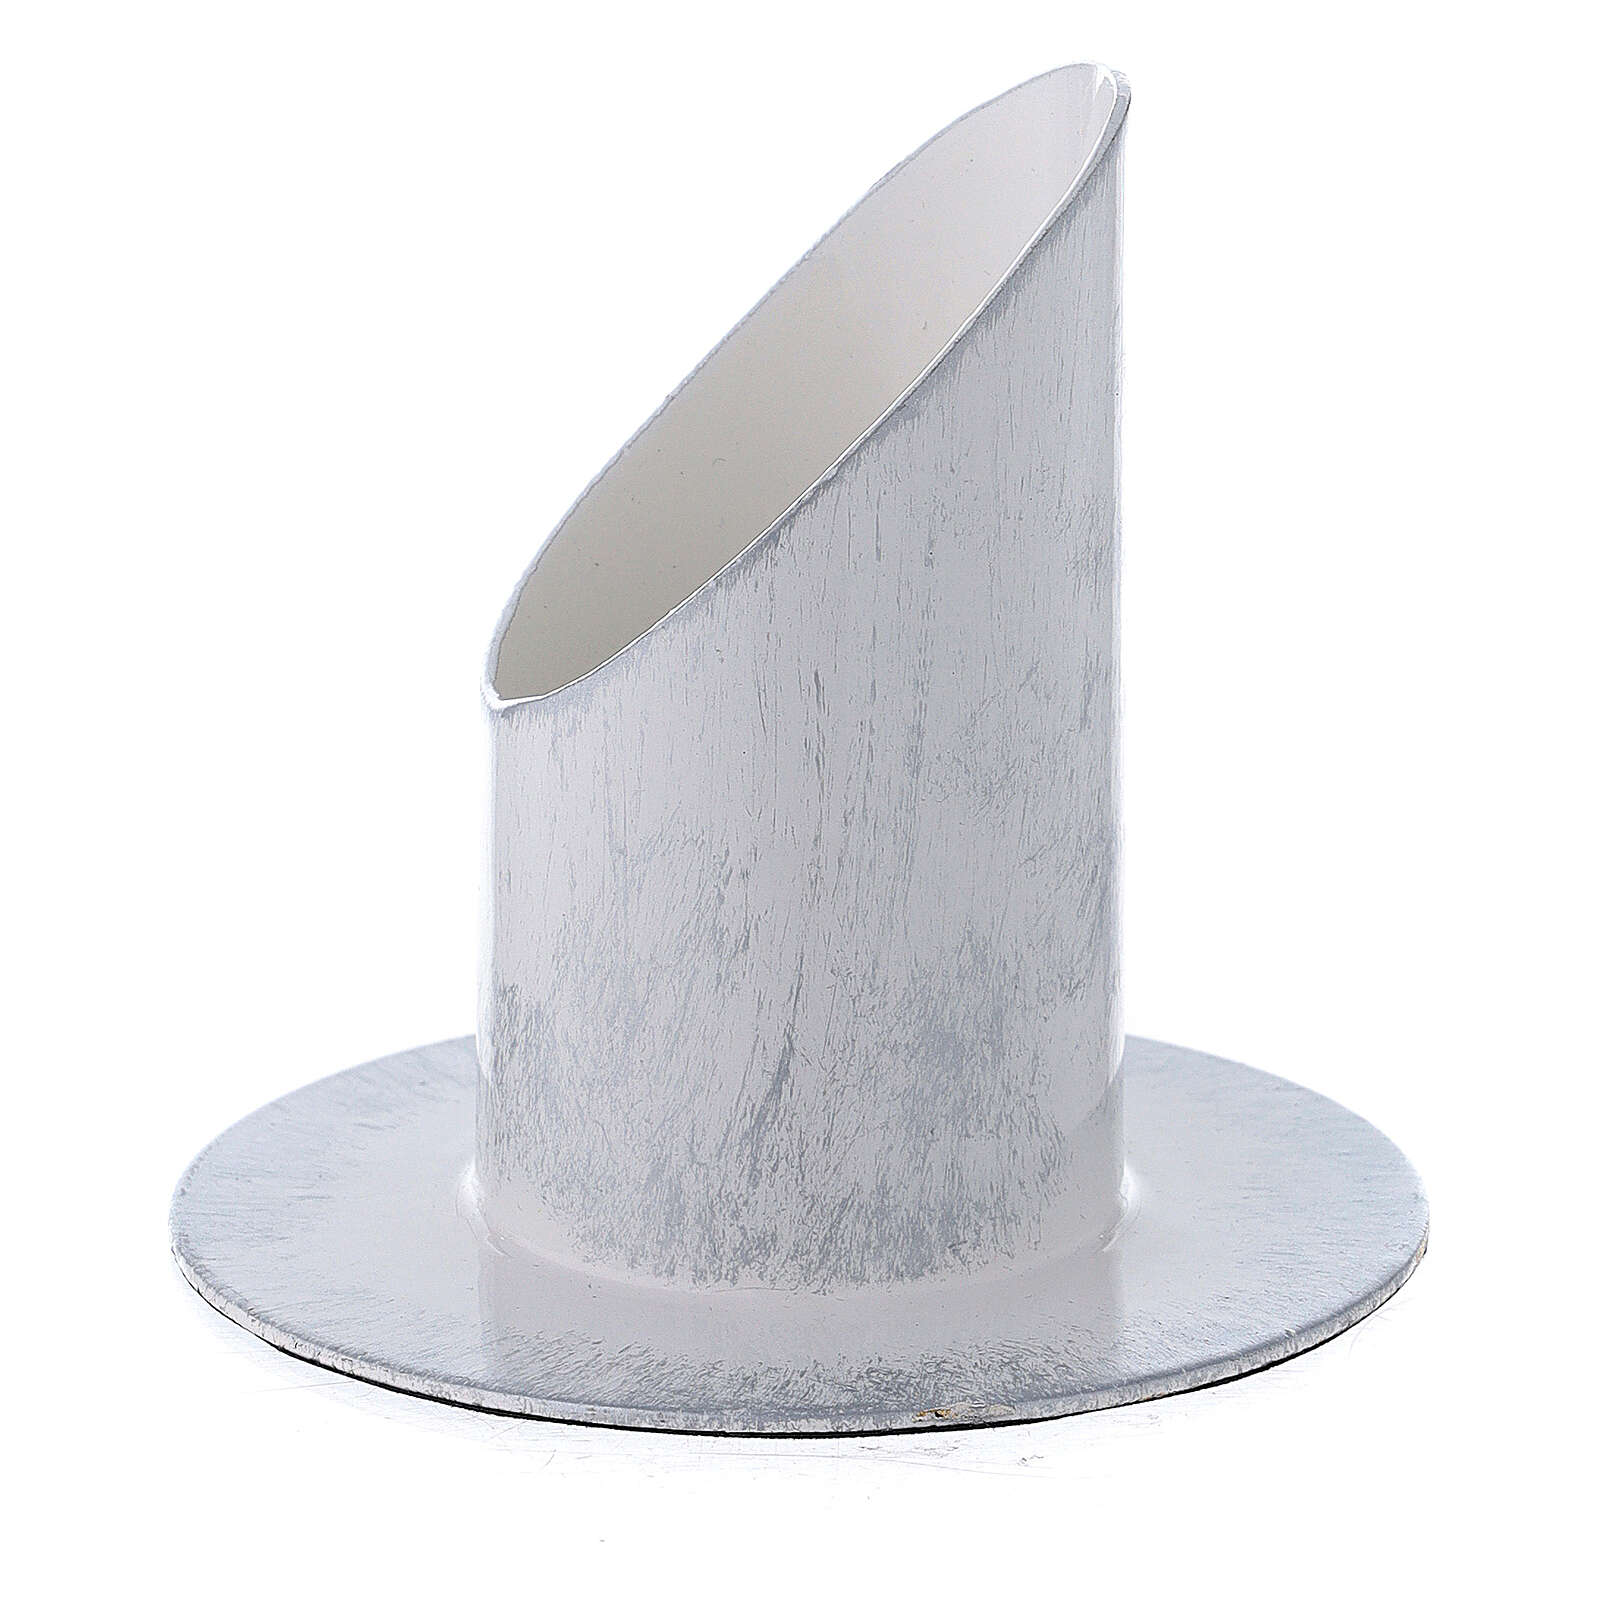 Portacandela bianco argento ferro 4 cm 3